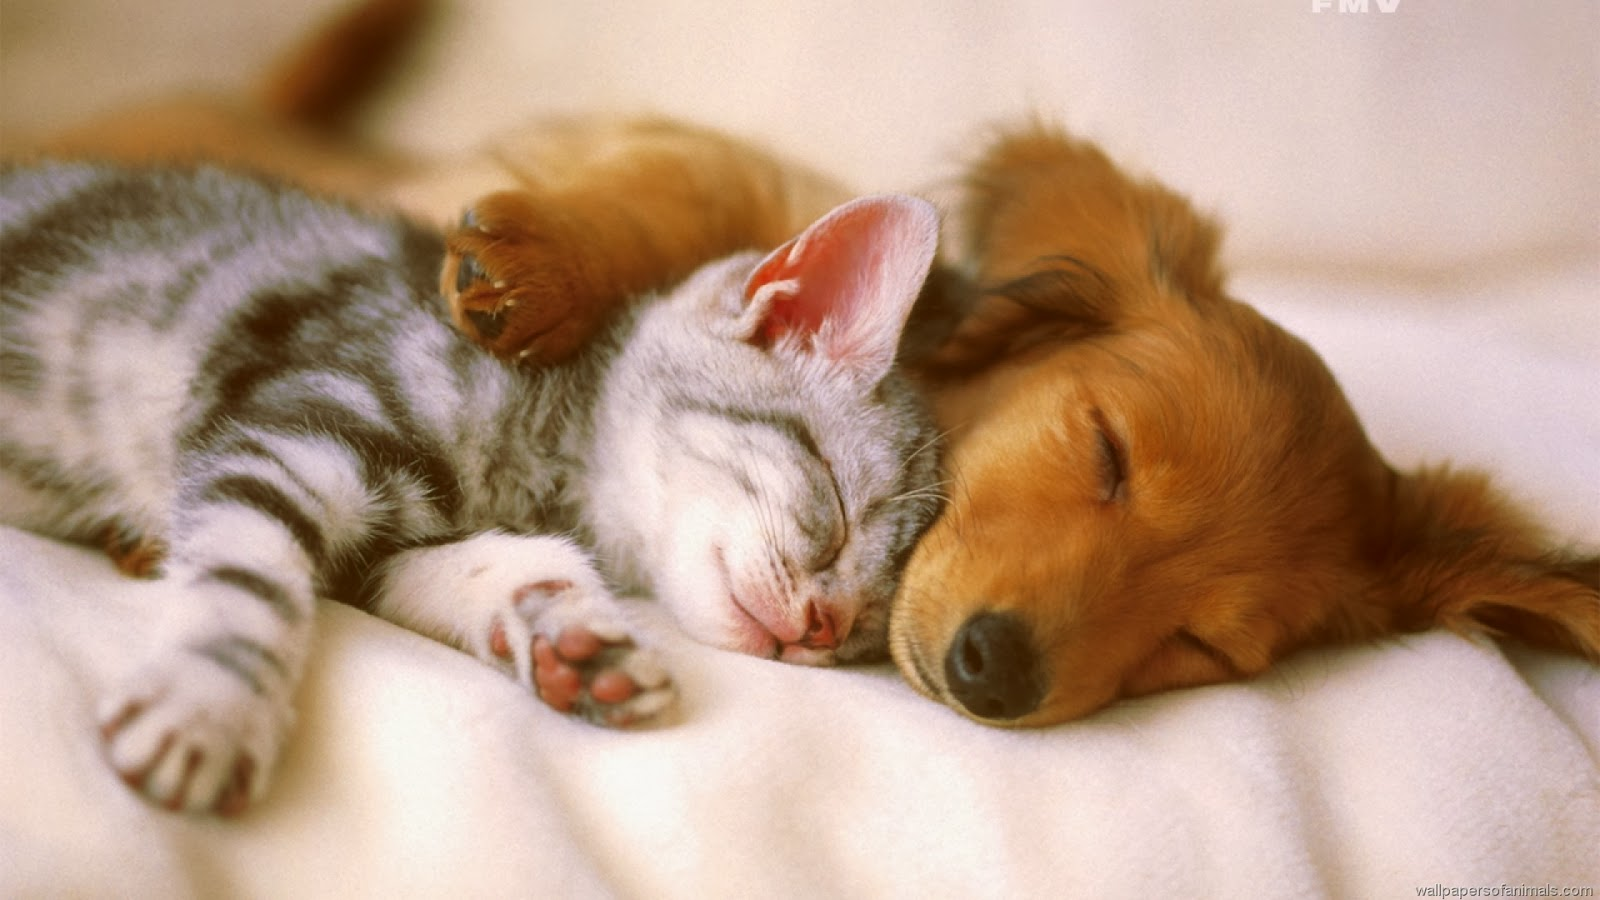 Cute Dog With Cat Desktop Background Wallpaper 1600x900